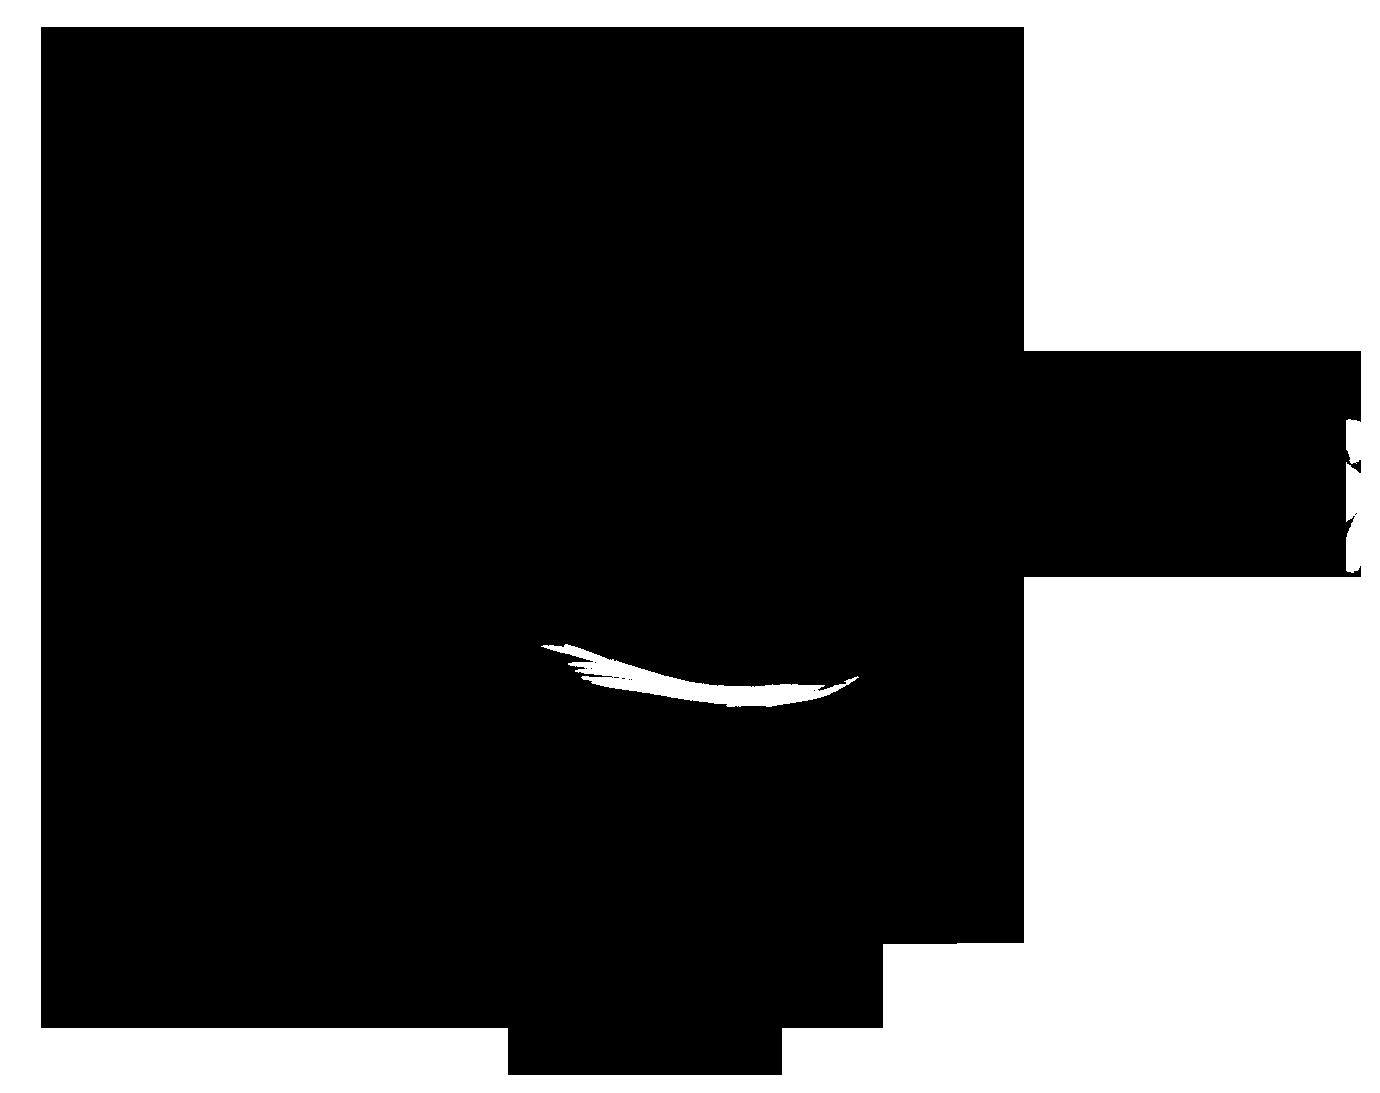 Br B Warning B Cannot Modify Header Information Headers Already Sent By Output Started At Home Runcloud Webapps Shuriken Views Header Php 137 In B Home Runcloud Webapps Shuriken Pages Gallery Php B On Line B 10 B Br Pencil Sketch Joker